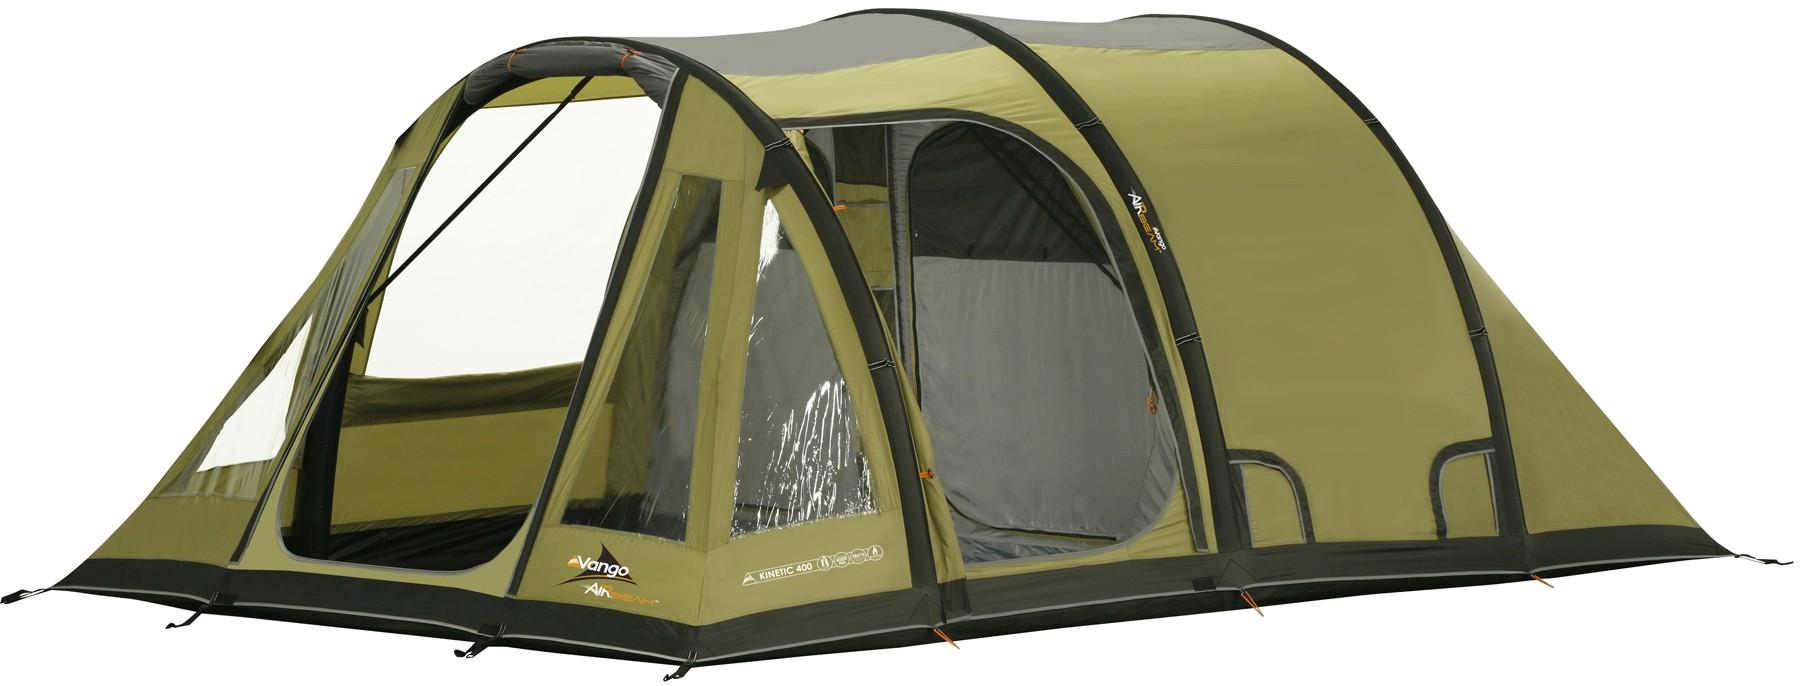 sc 1 st  Outdoor Megastore & Vango Kinetic 400 Airbeam Tunnel Tent